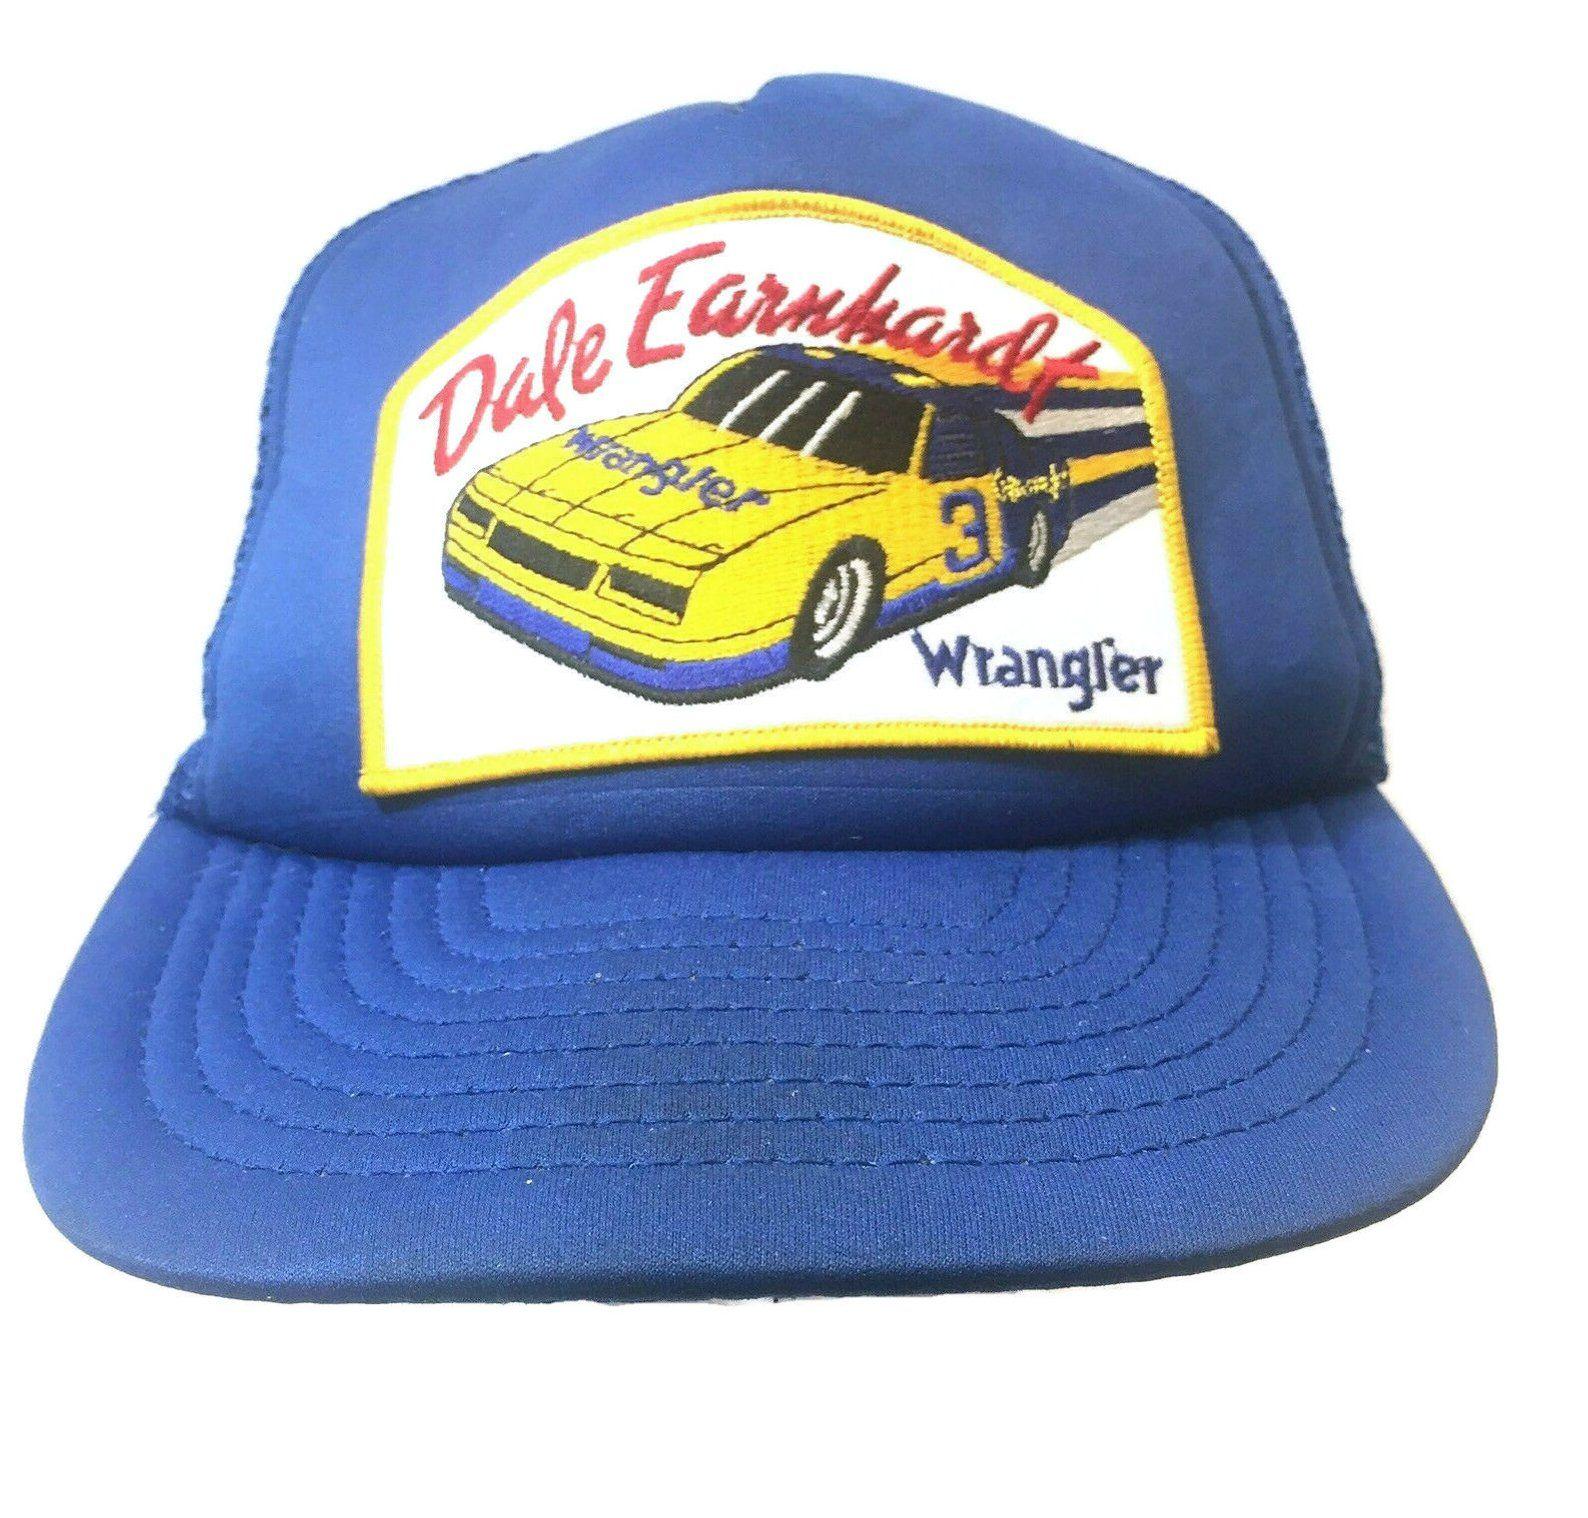 4772643a4 Vintage 80s Dale Earnhardt 3 Wrangler Patch Snapback Trucker Hat Cap ...